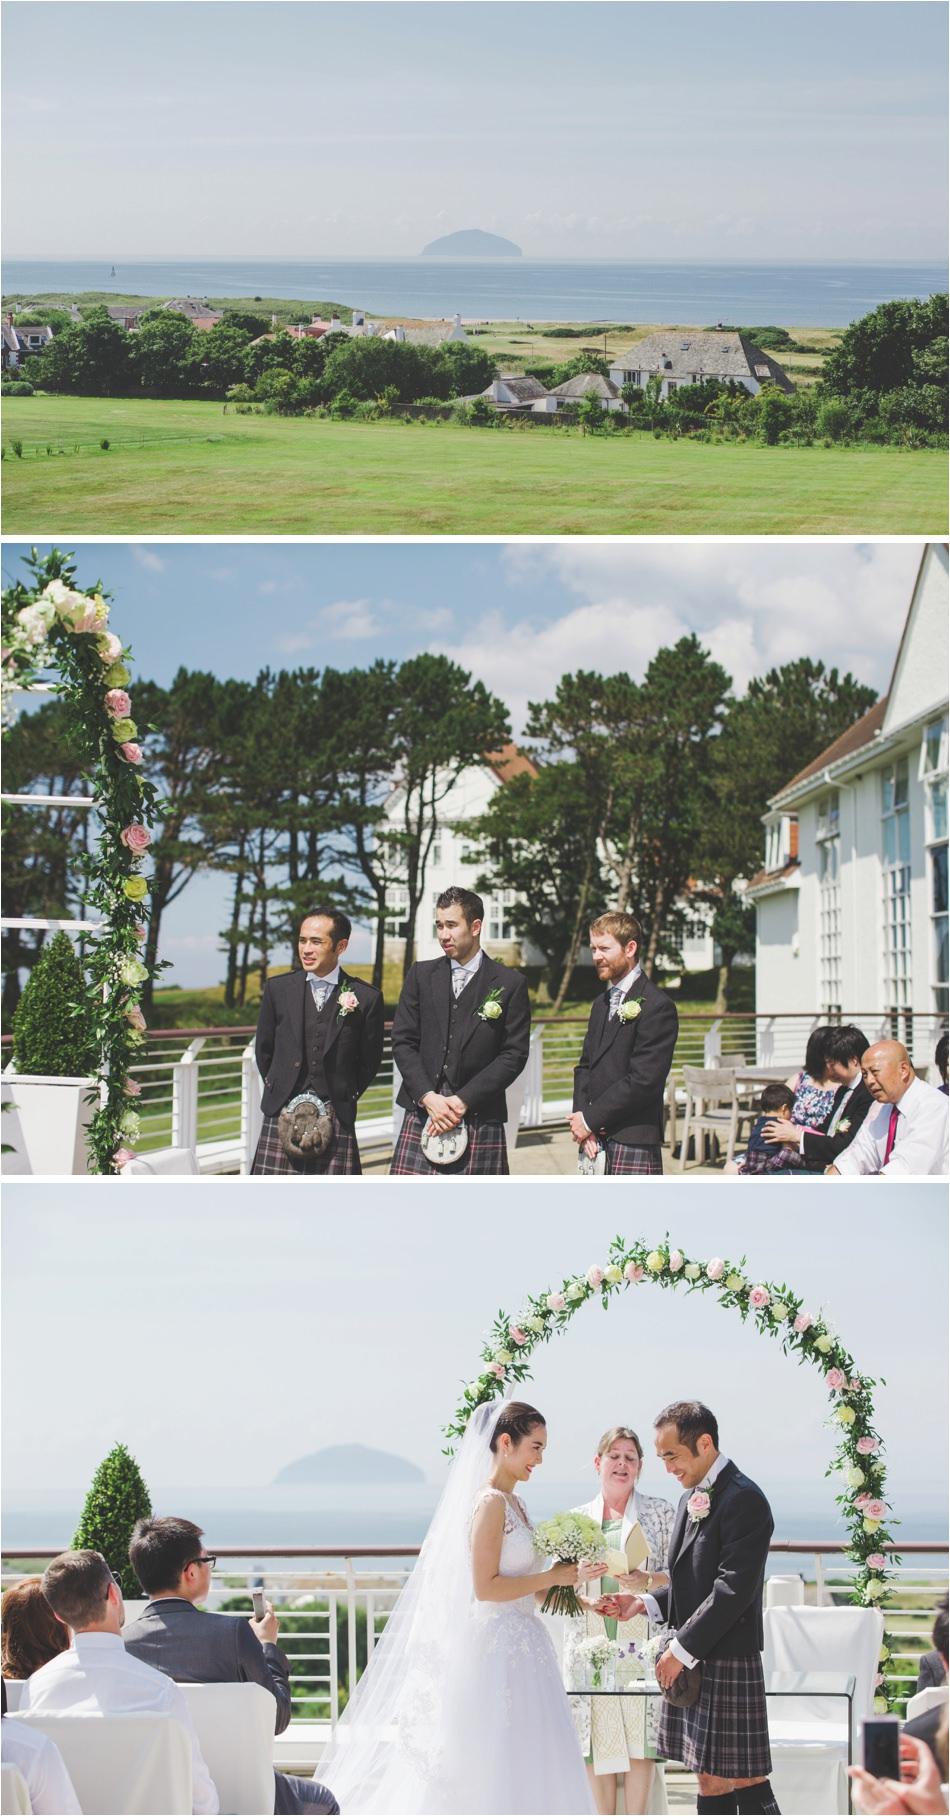 fine art wedding photographers scotland glasgow 5-1.jpg